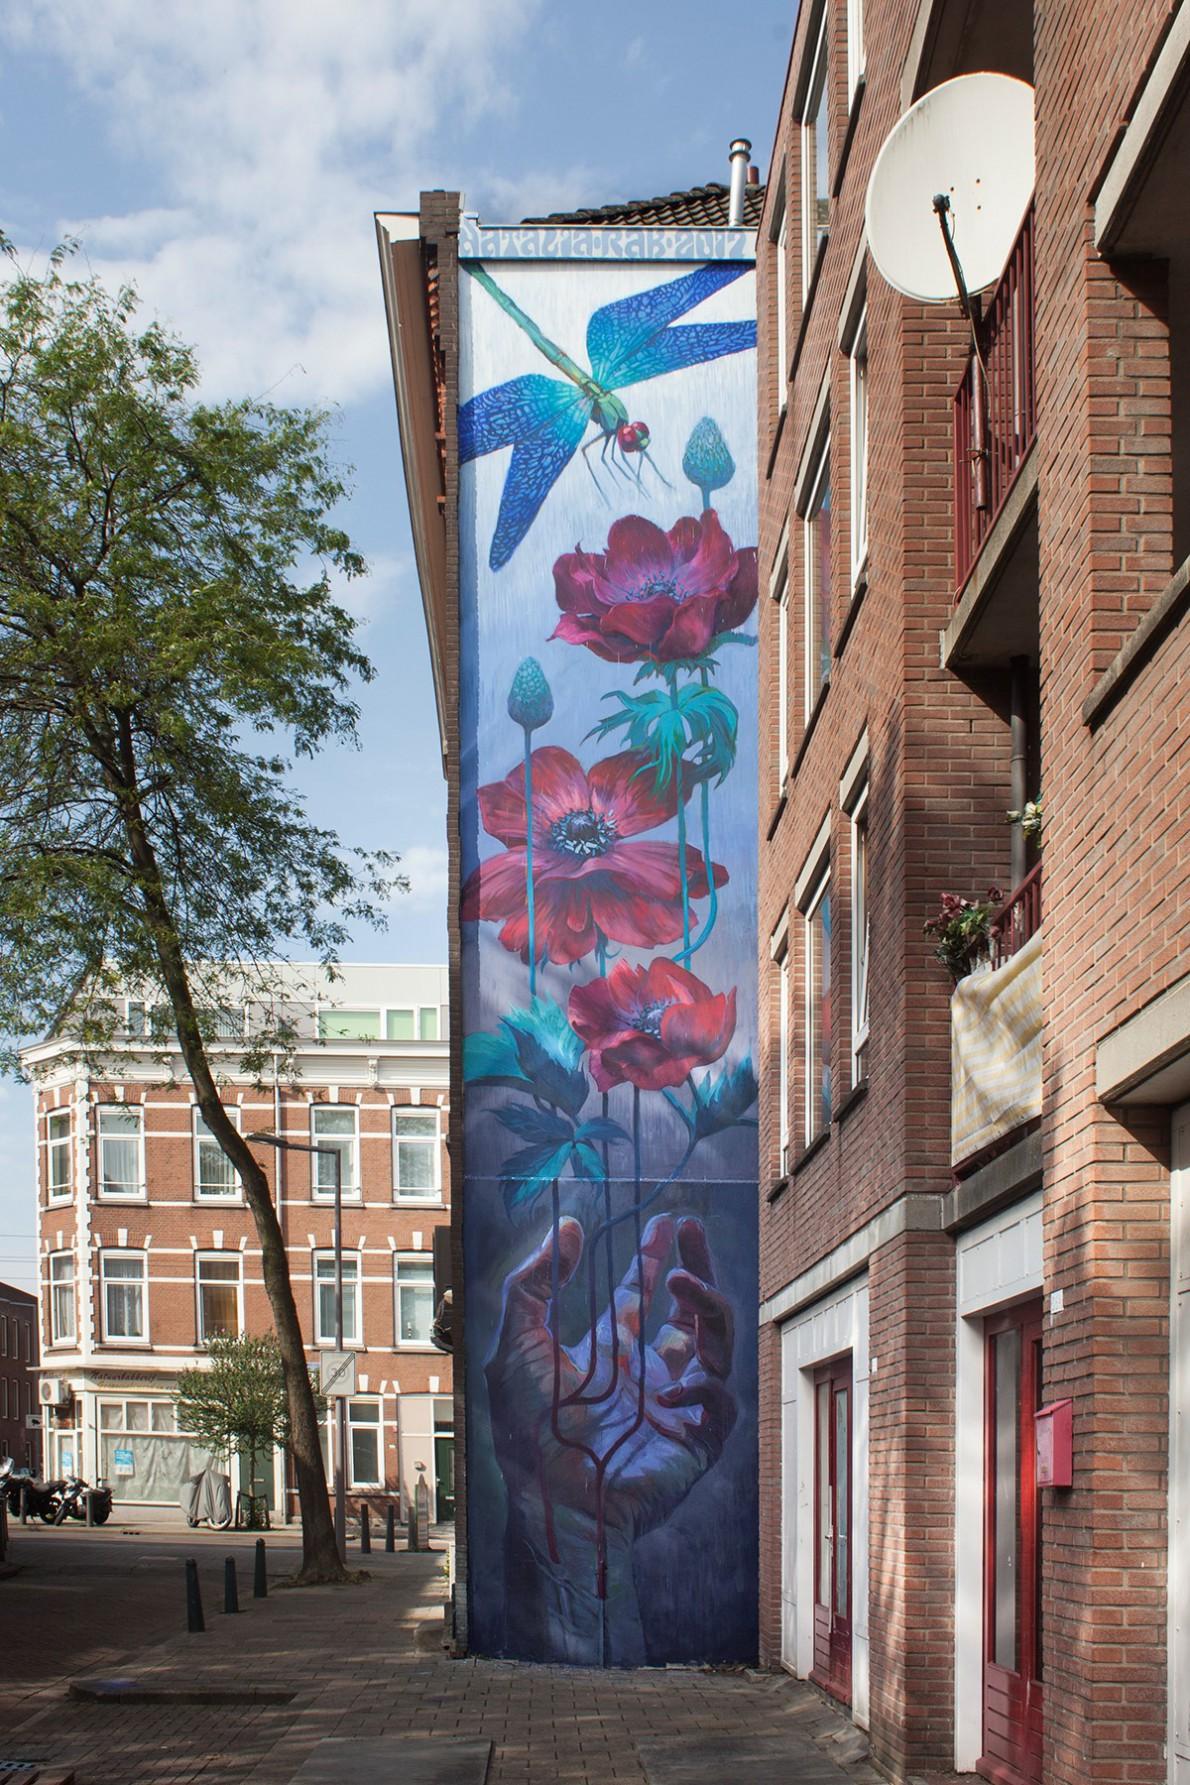 Natalia Rak, Resurrection, Vletstraat Rotterdam, 2017. Sober Walls by Sober Collective.